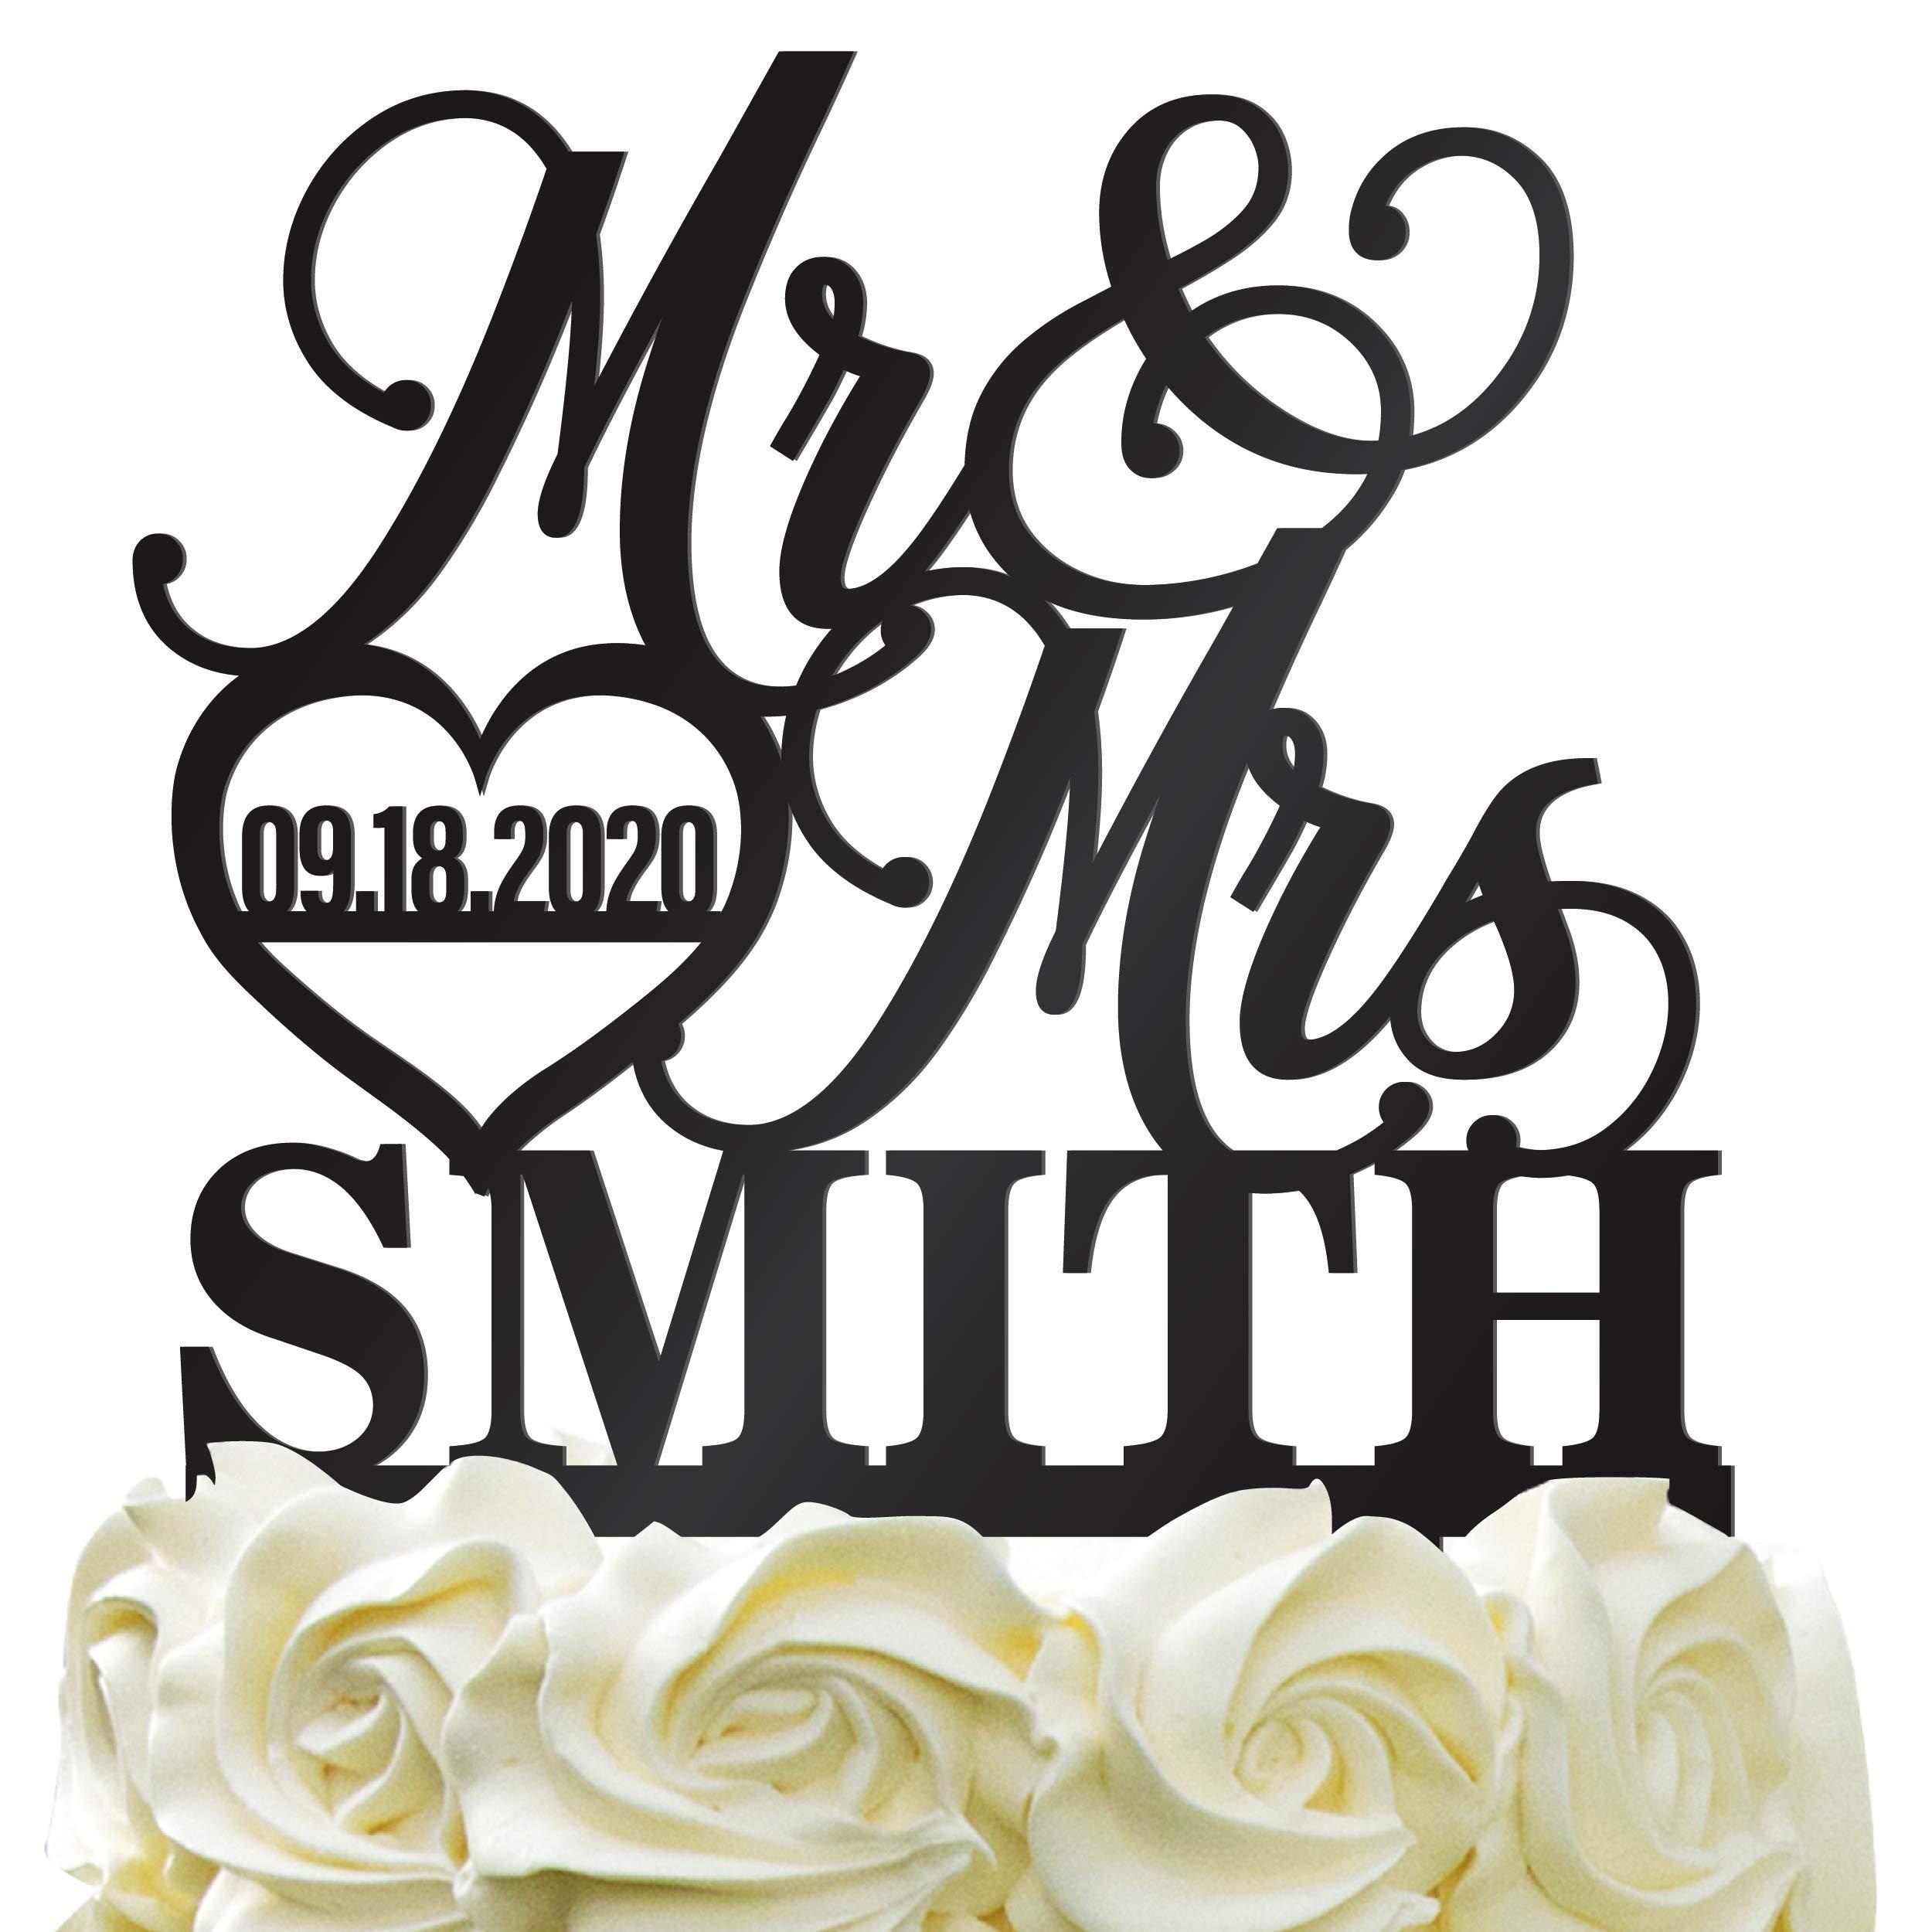 Personalized Wedding Cake Topper - Wedding Cake Decoration Elegant Customized Mr-Mrs, Last Name & Date With HeartColor Acrylic